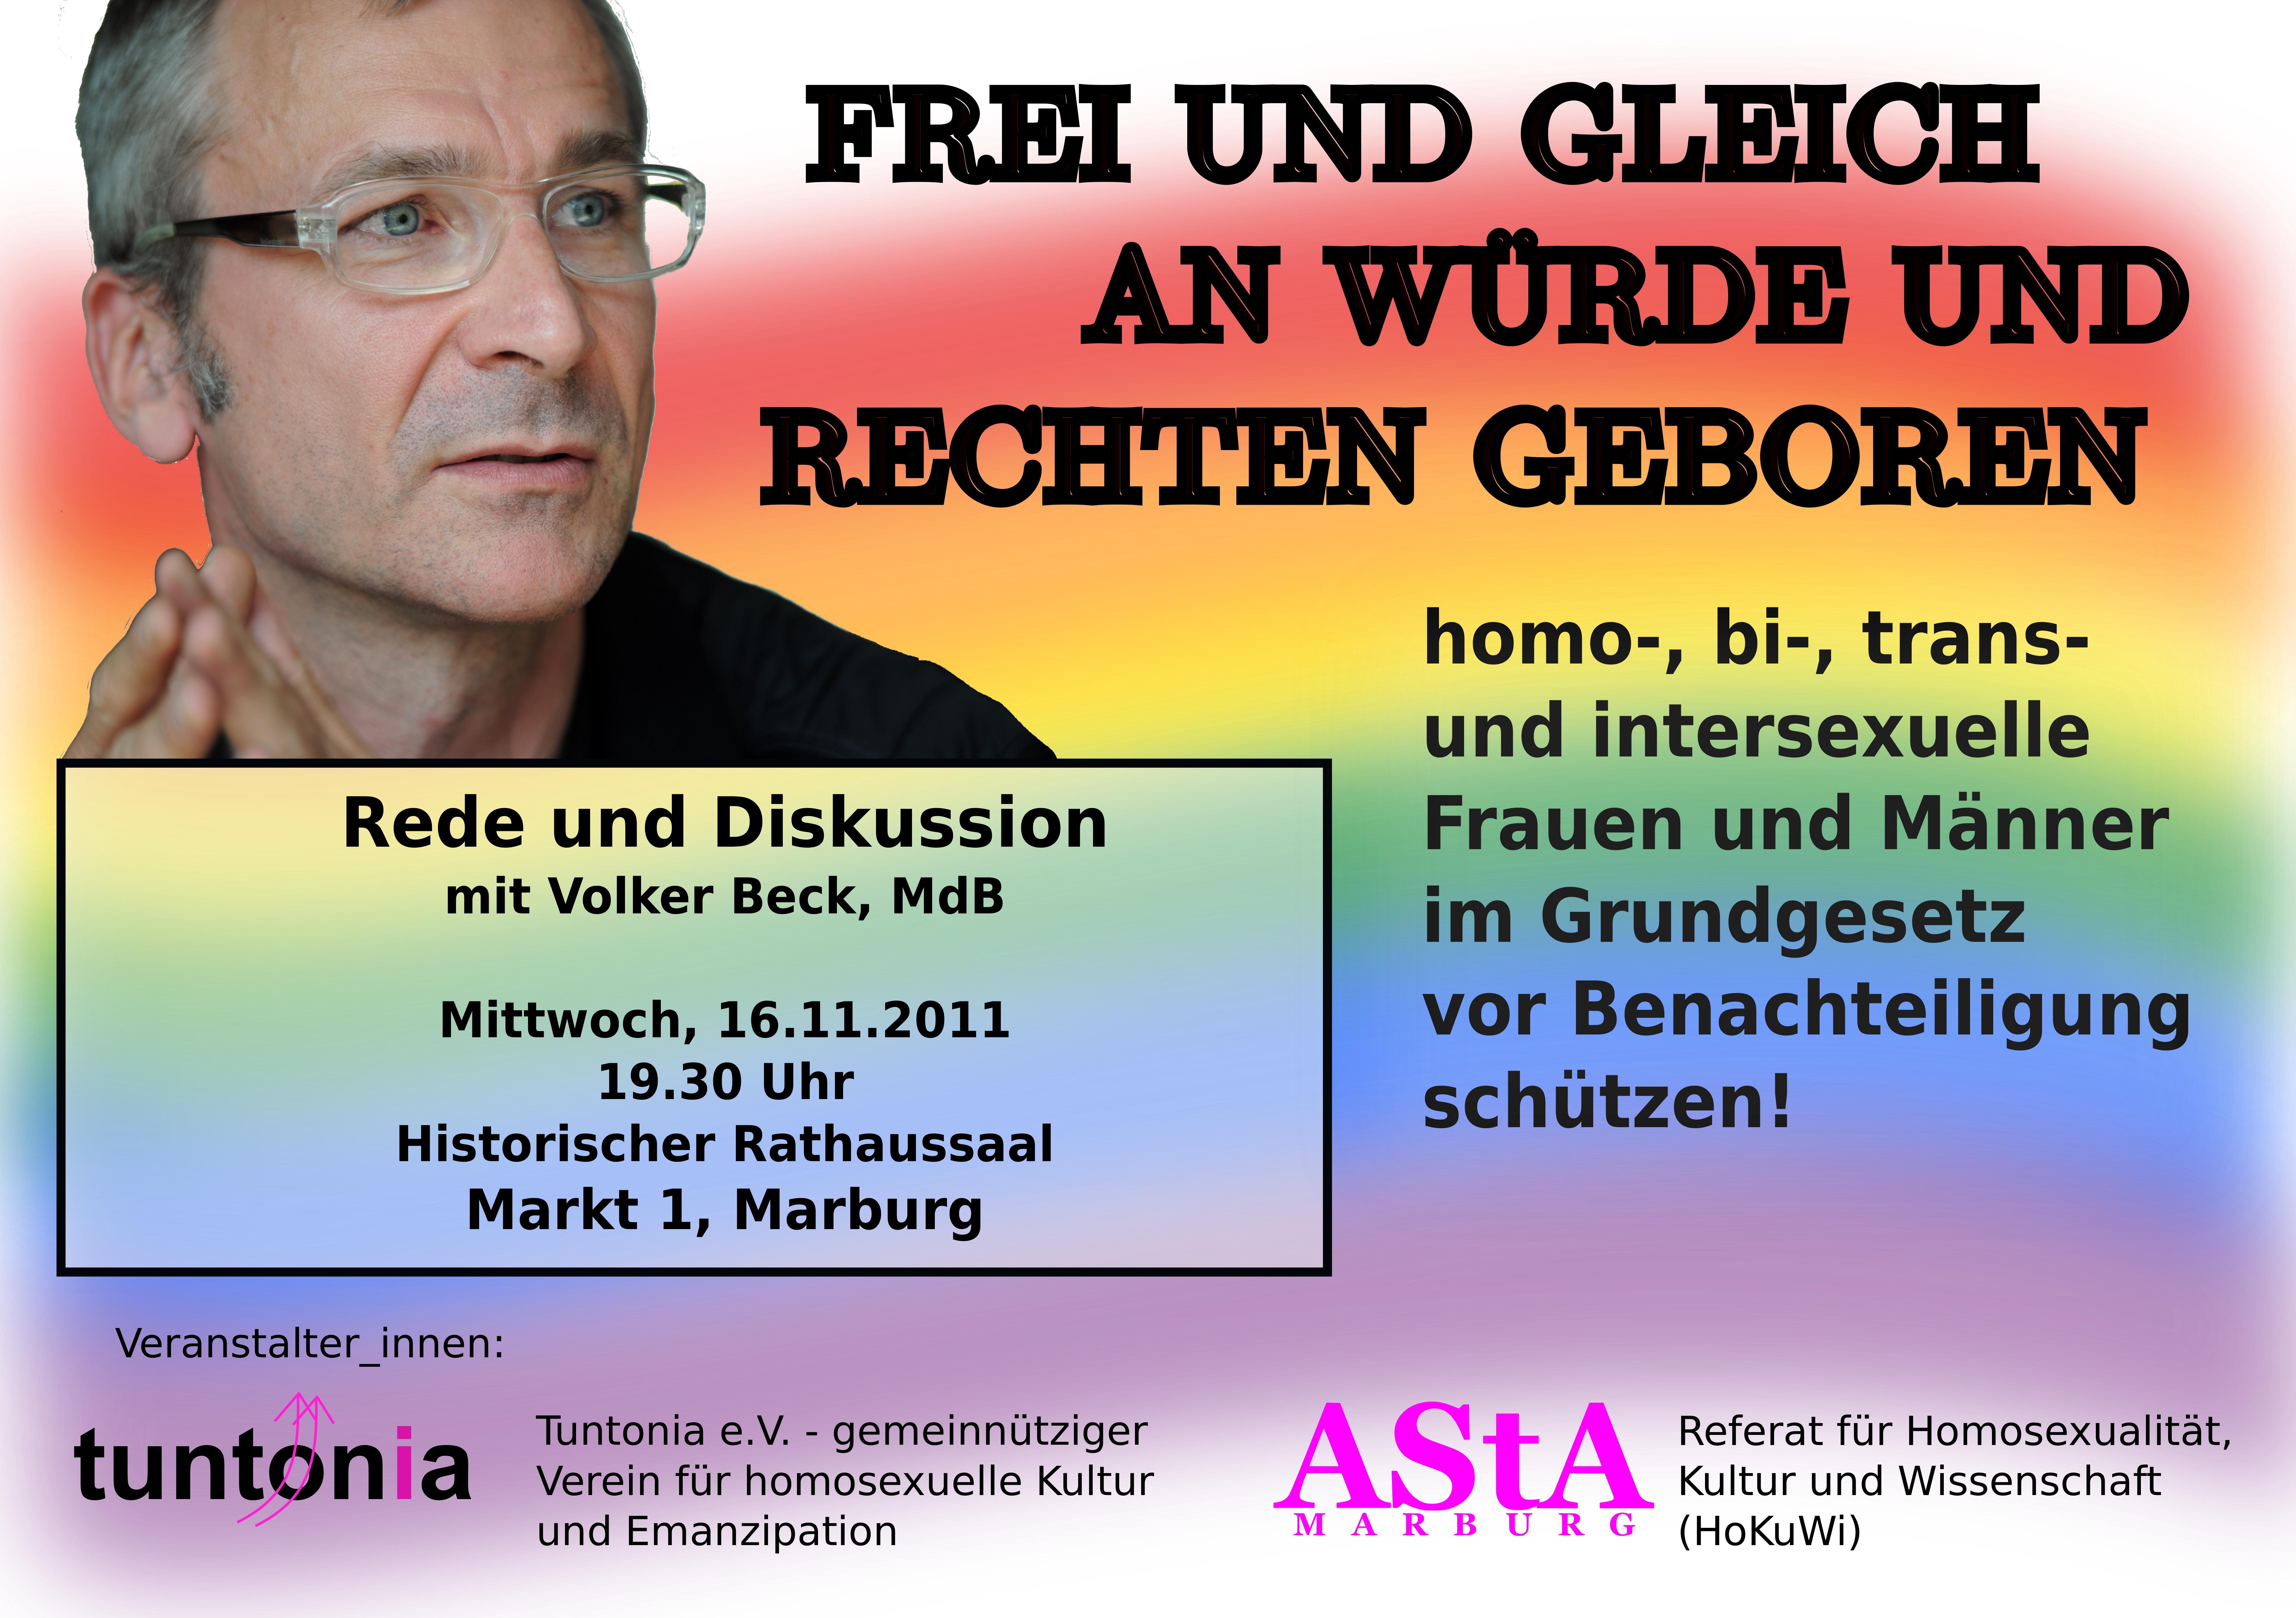 Plakat Veranstaltung mit Volker Beck